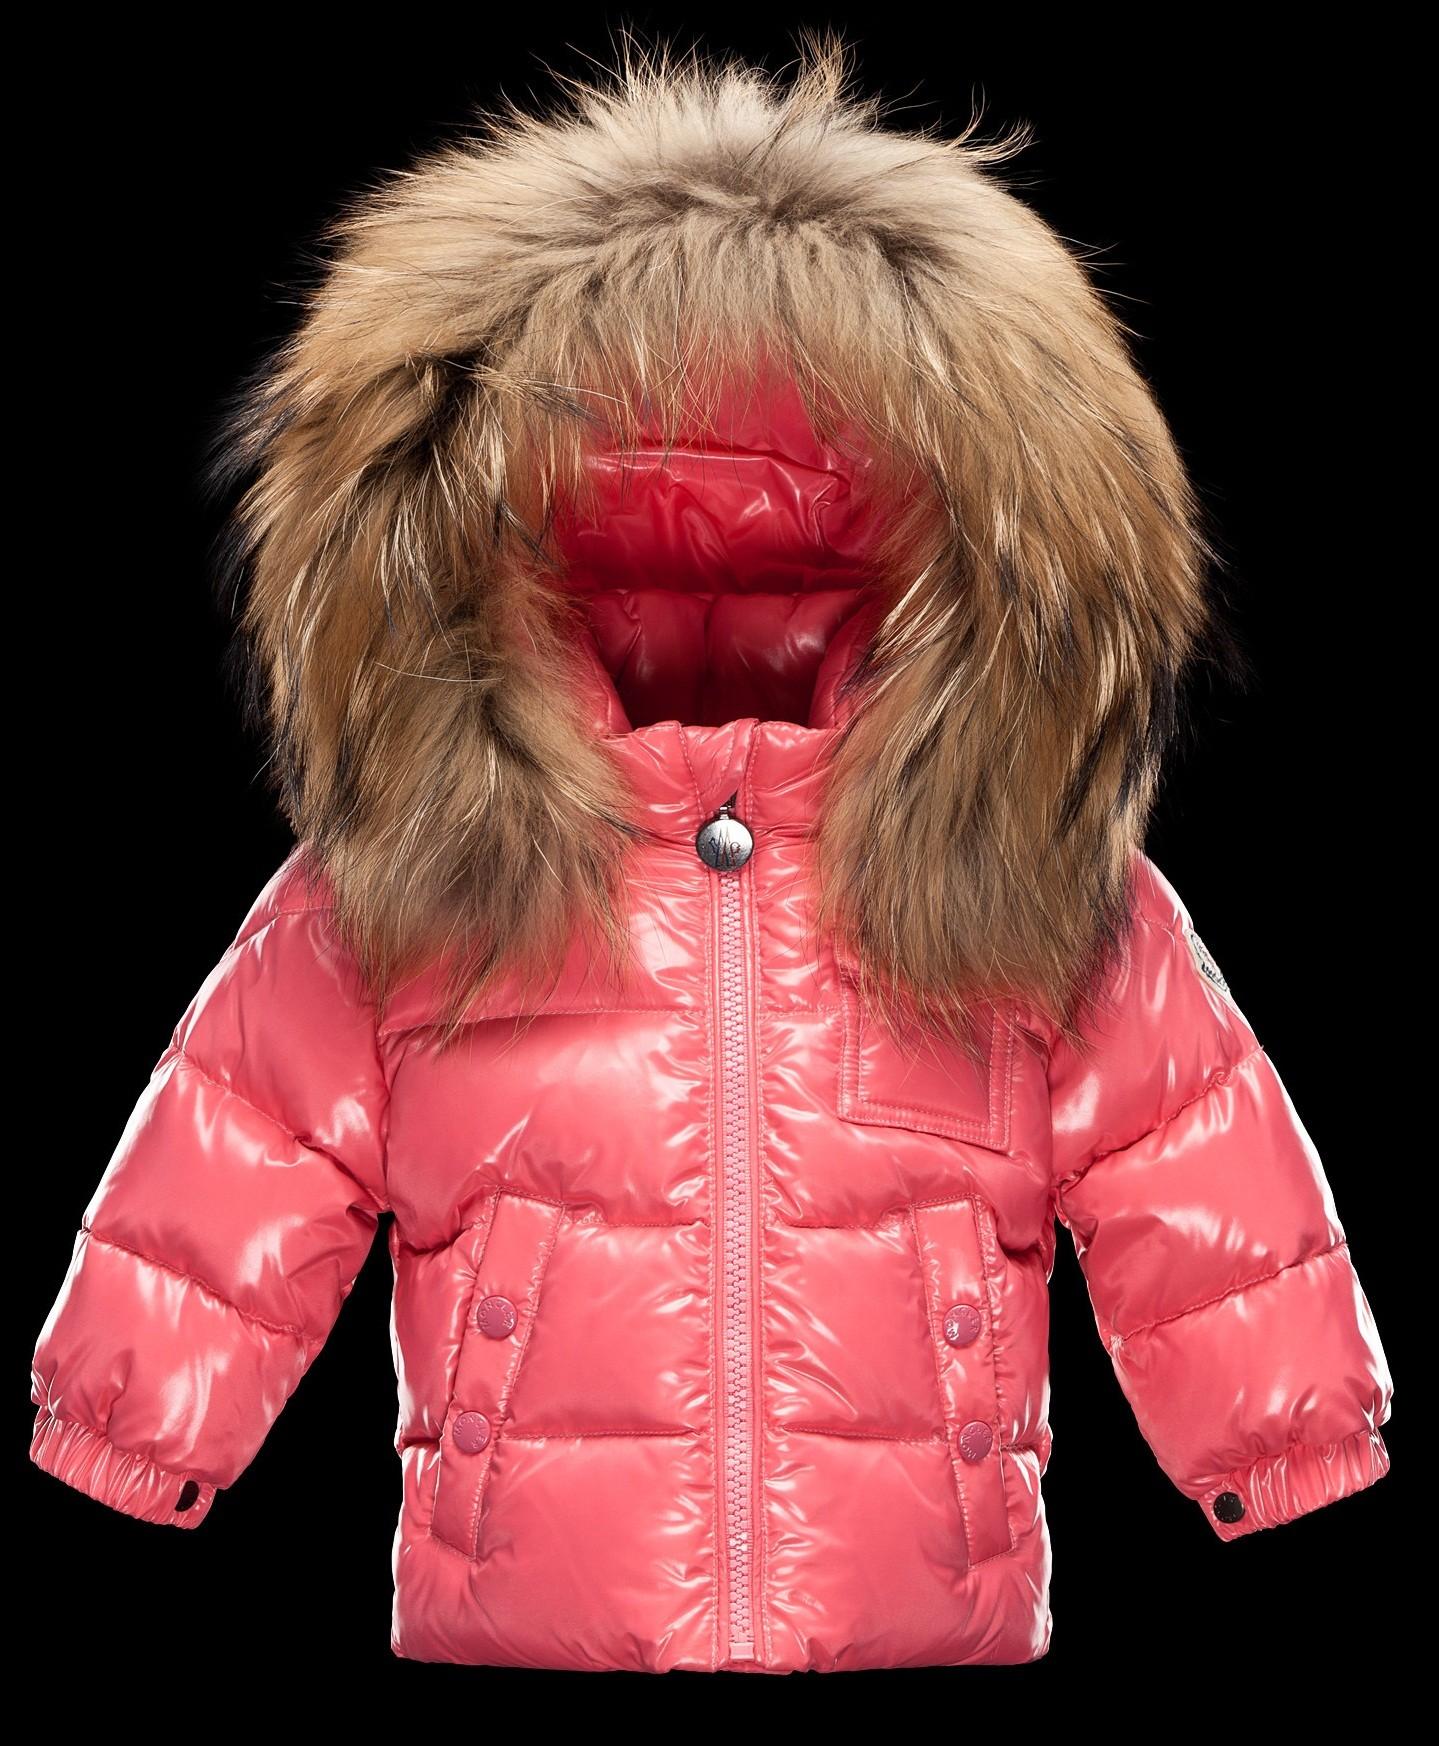 Moncler  ENFANT K2 Baby Down Jacket пуховая куртка с капюшоном 3/36 месяцев Розовый